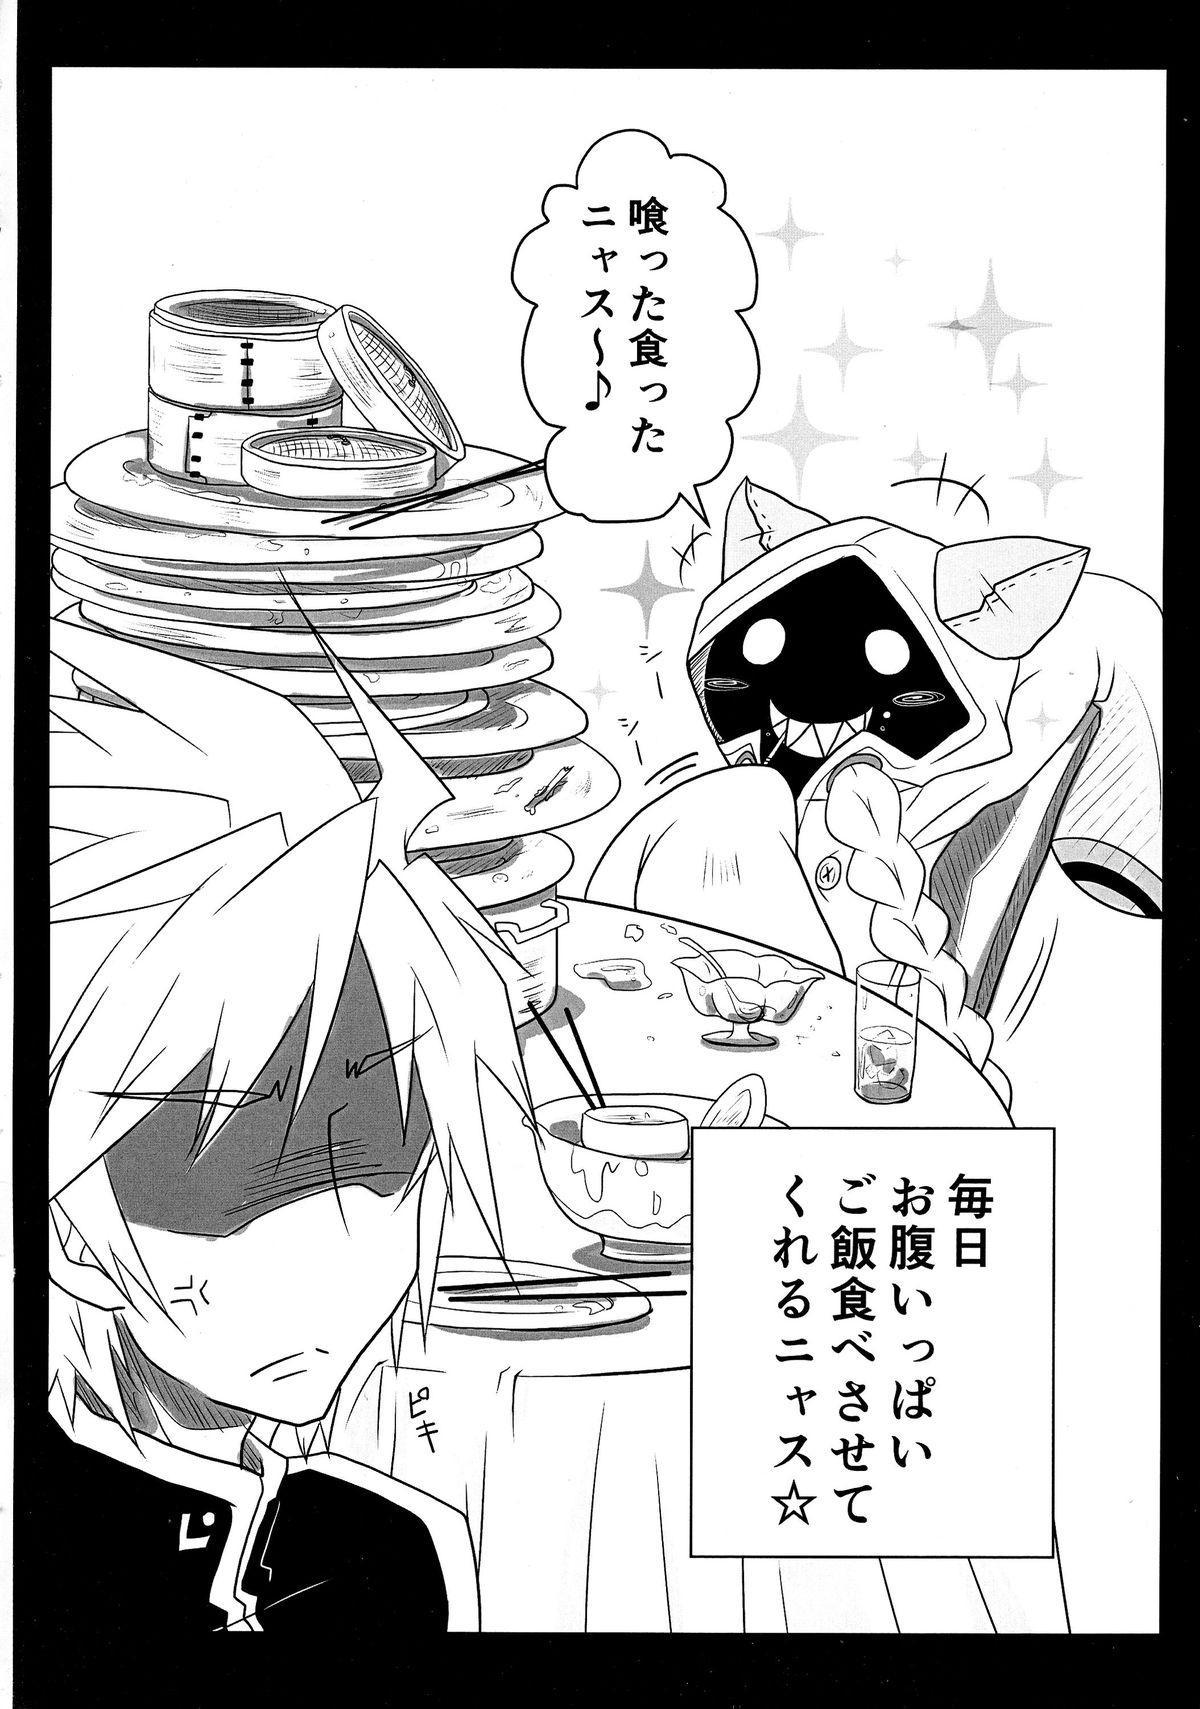 Tao no Ongaeshi 3